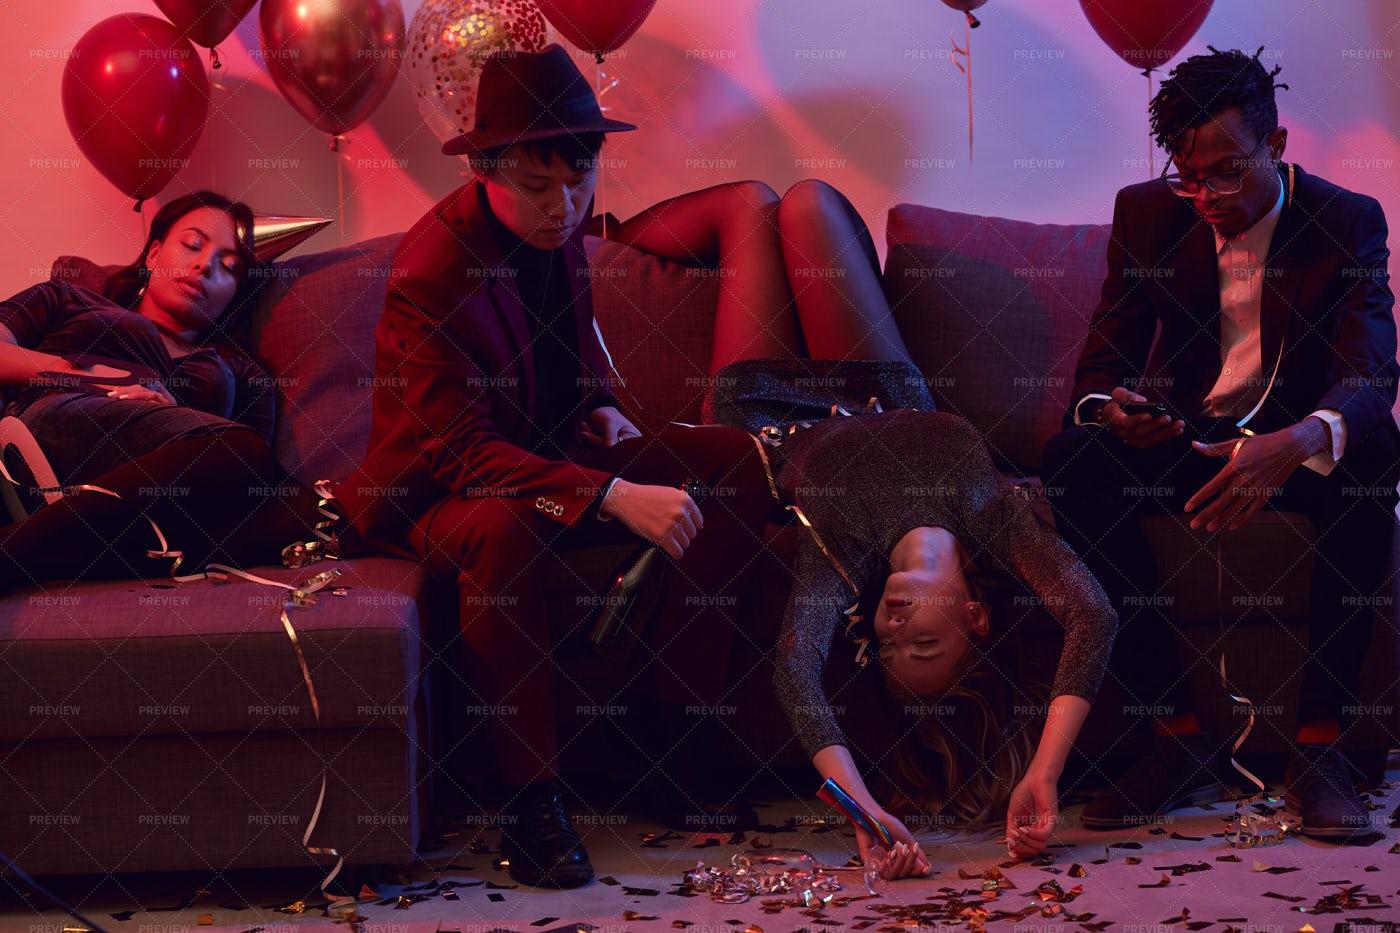 Drunk People In Nightclub: Stock Photos